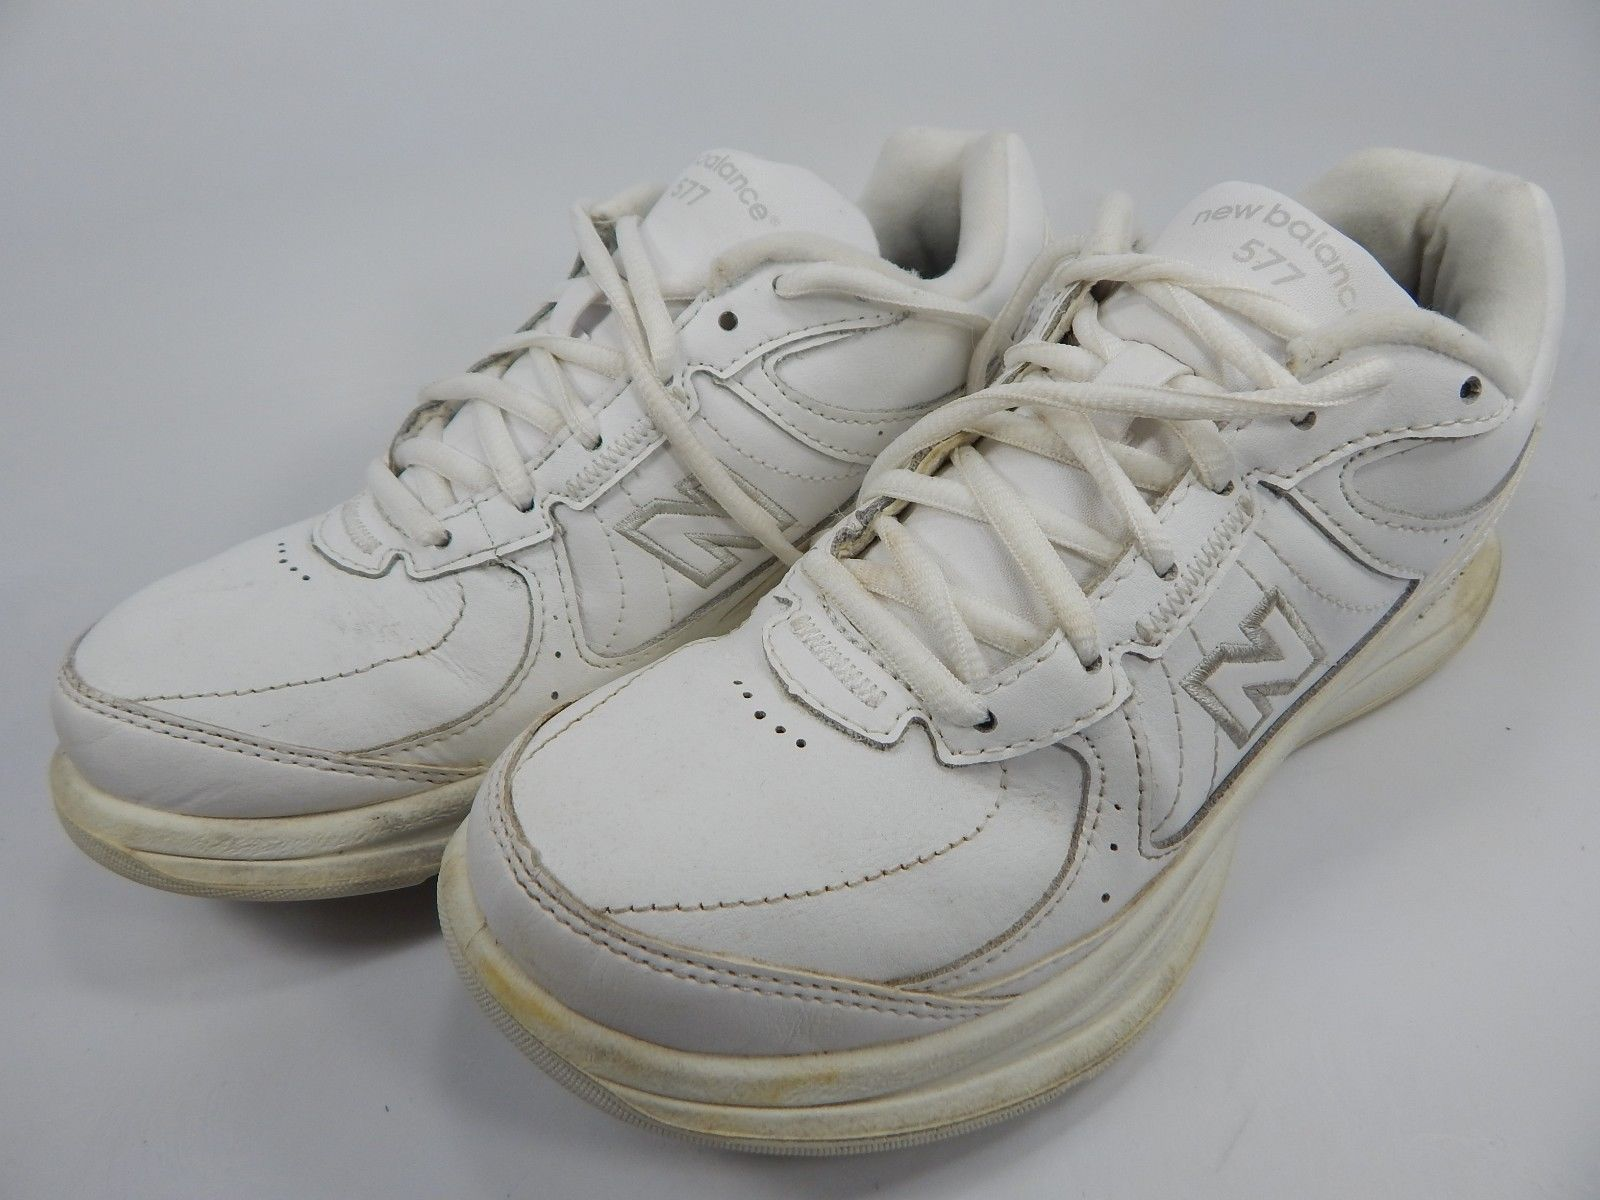 New Balance 577 Women's Walking Shoes Size US 6.5 M (B) EU 37 White WW577WT